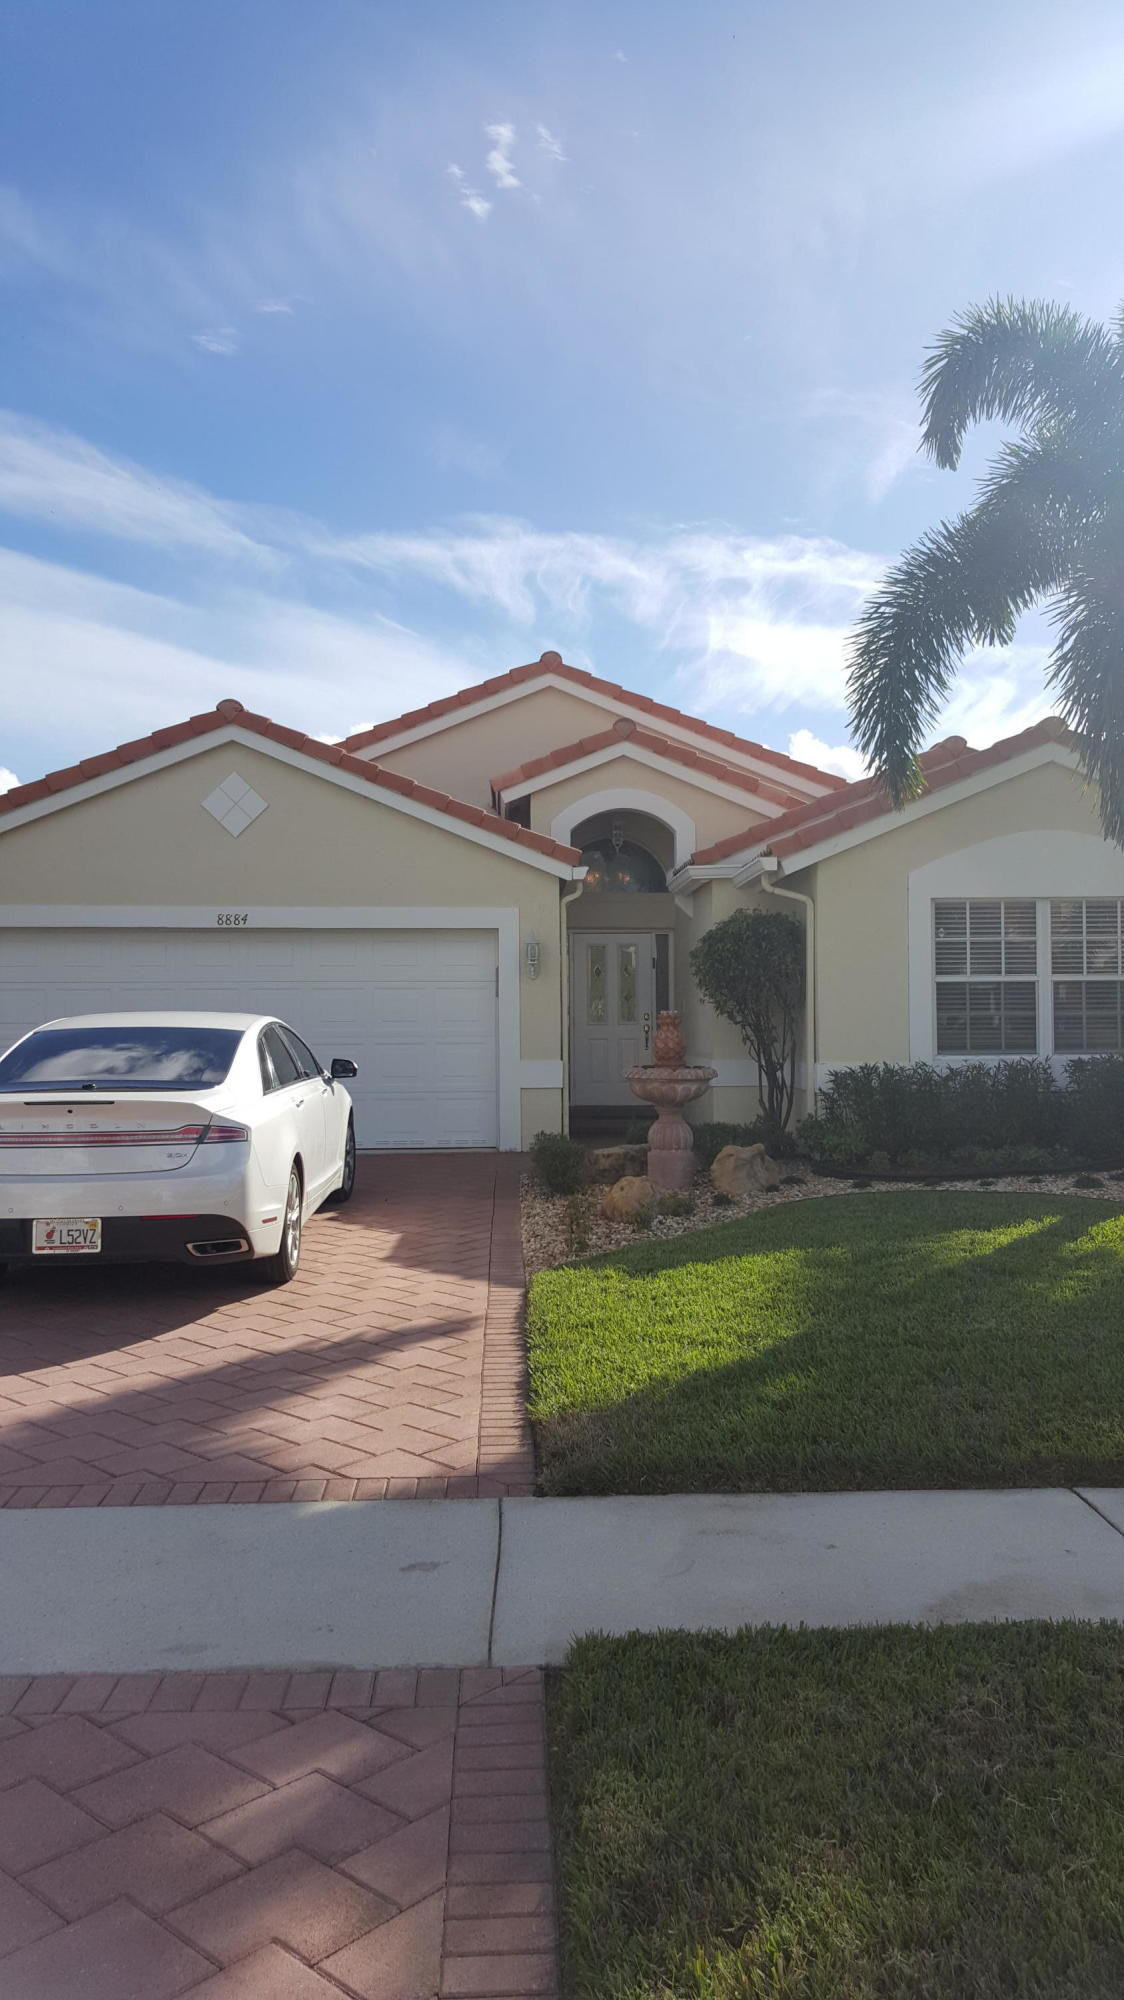 8884 Harrods Drive, Boca Raton, FL 33433